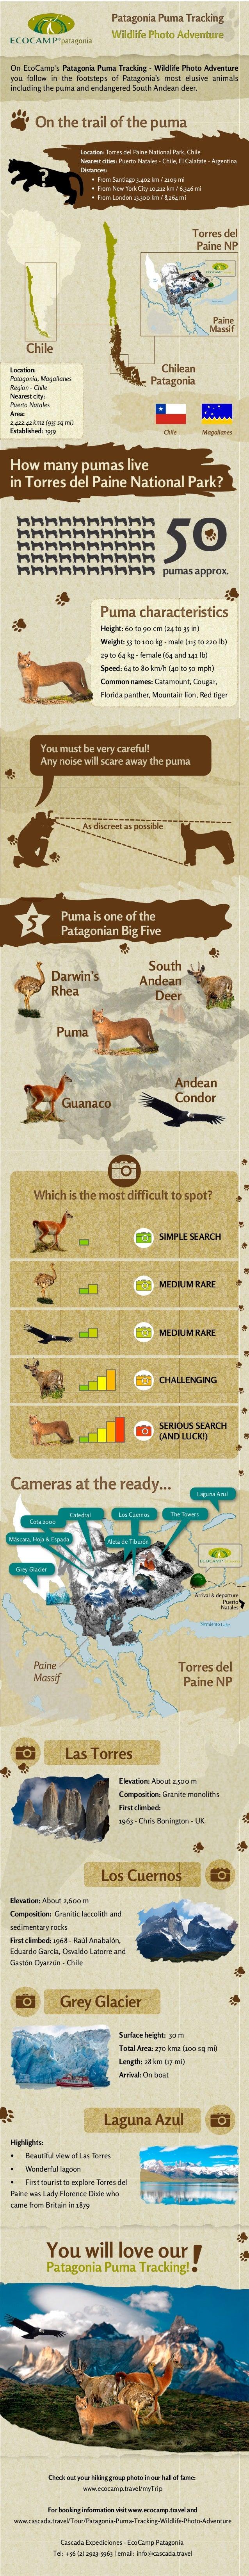 Patagonia Puma Tracking - Wildlife Photo Adventure Infographic